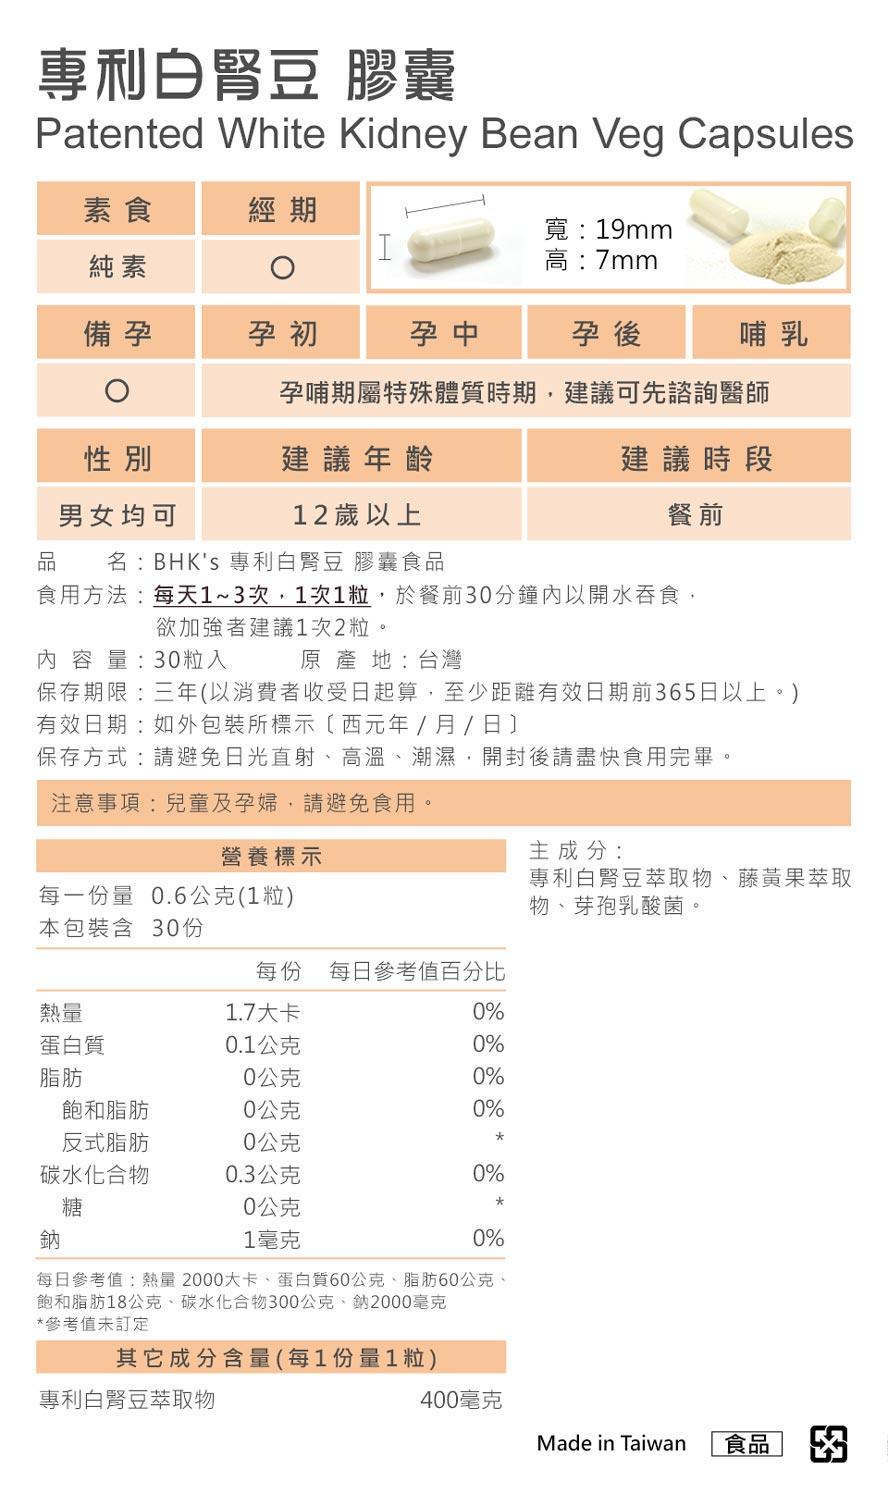 BHK's白肾豆通过各种检验,安全无疑虑,无副作用。